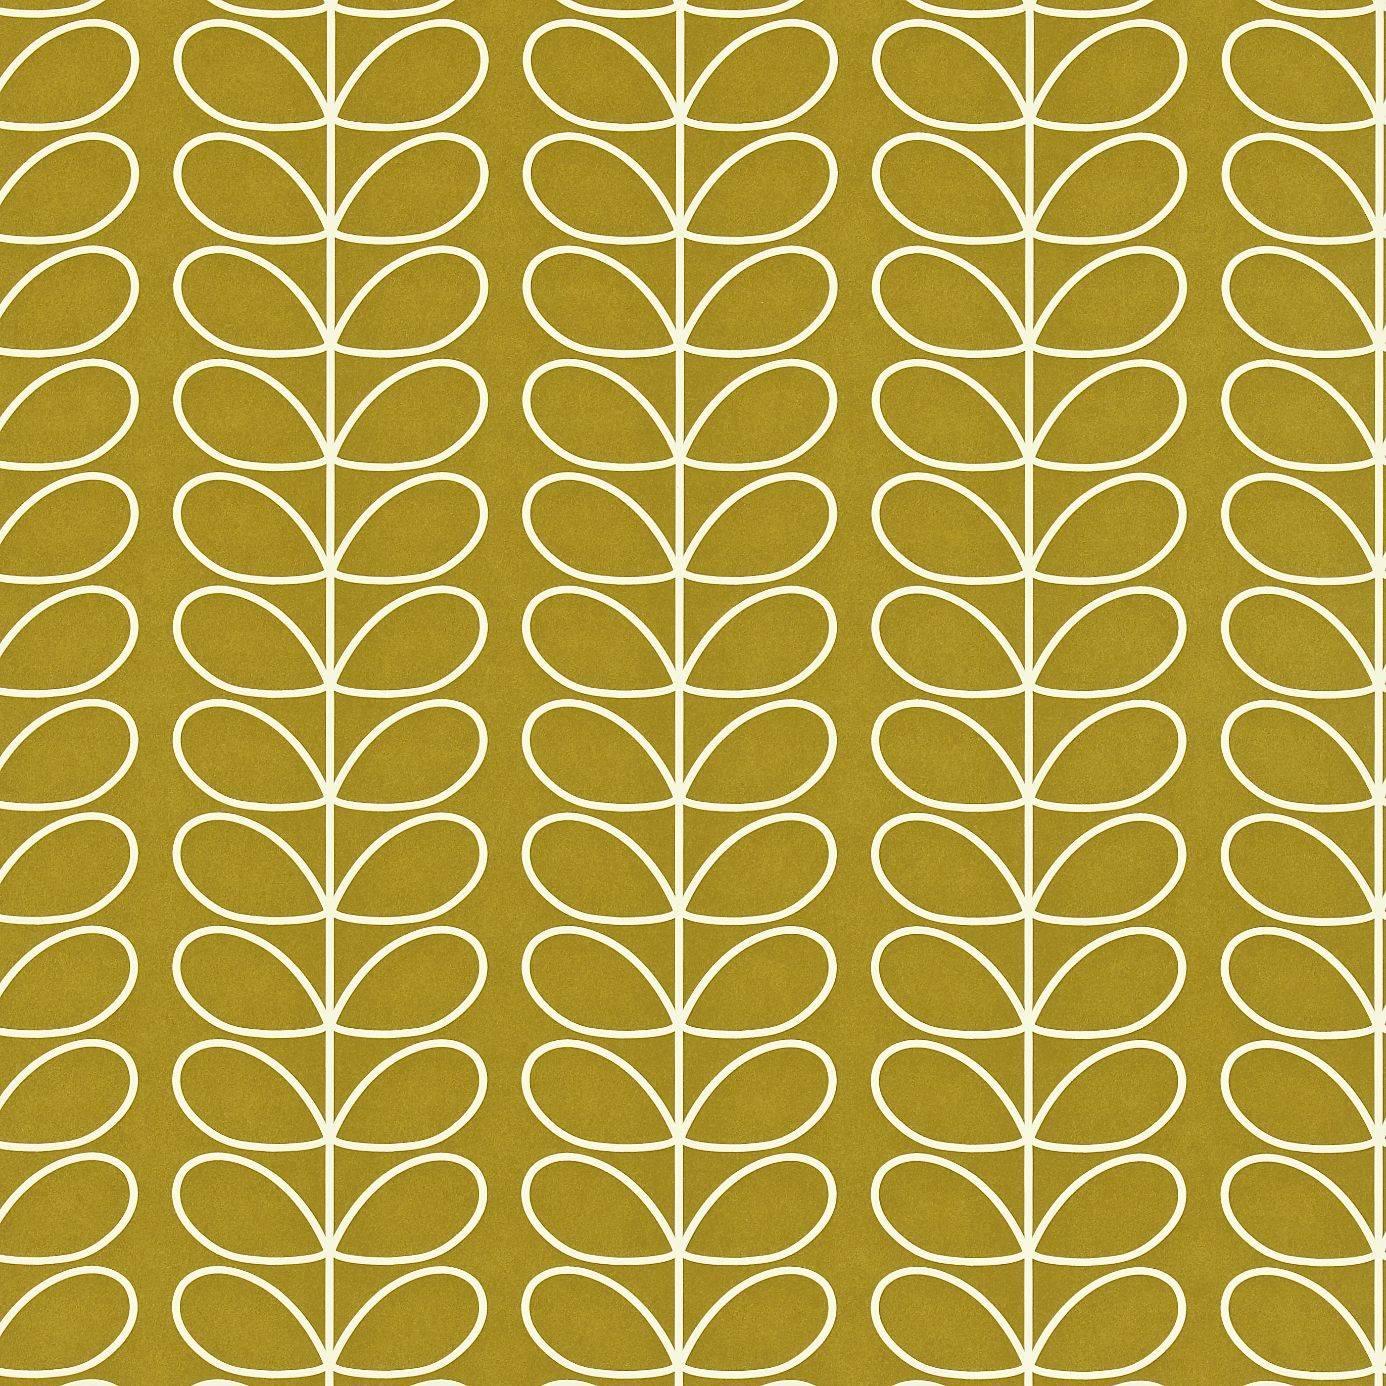 Linear Stem Wallpaper   Olive 110401   Harlequin Orla 1386x1386